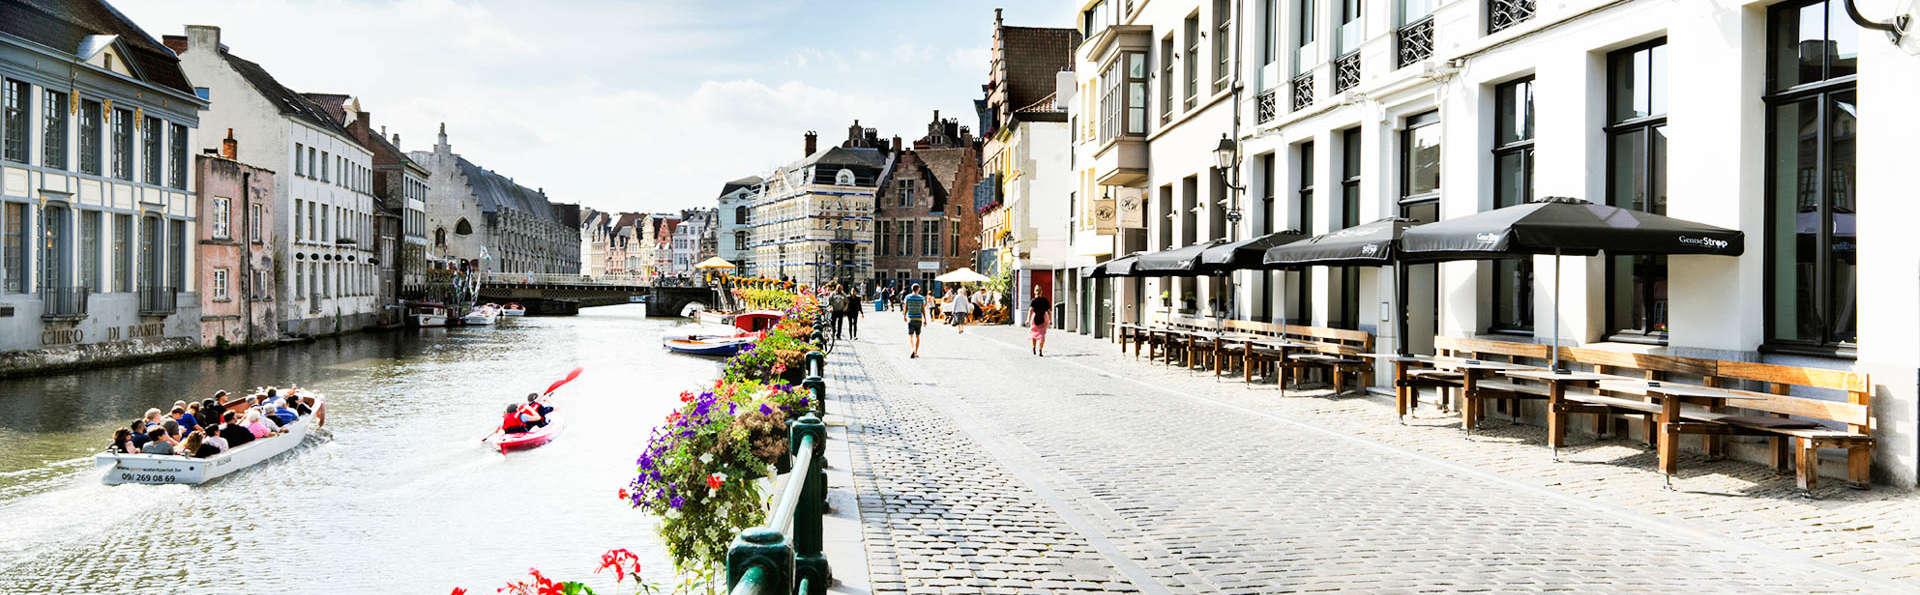 Hotel Harmony (Gent) - EDIT_N5_TERRACE.jpg